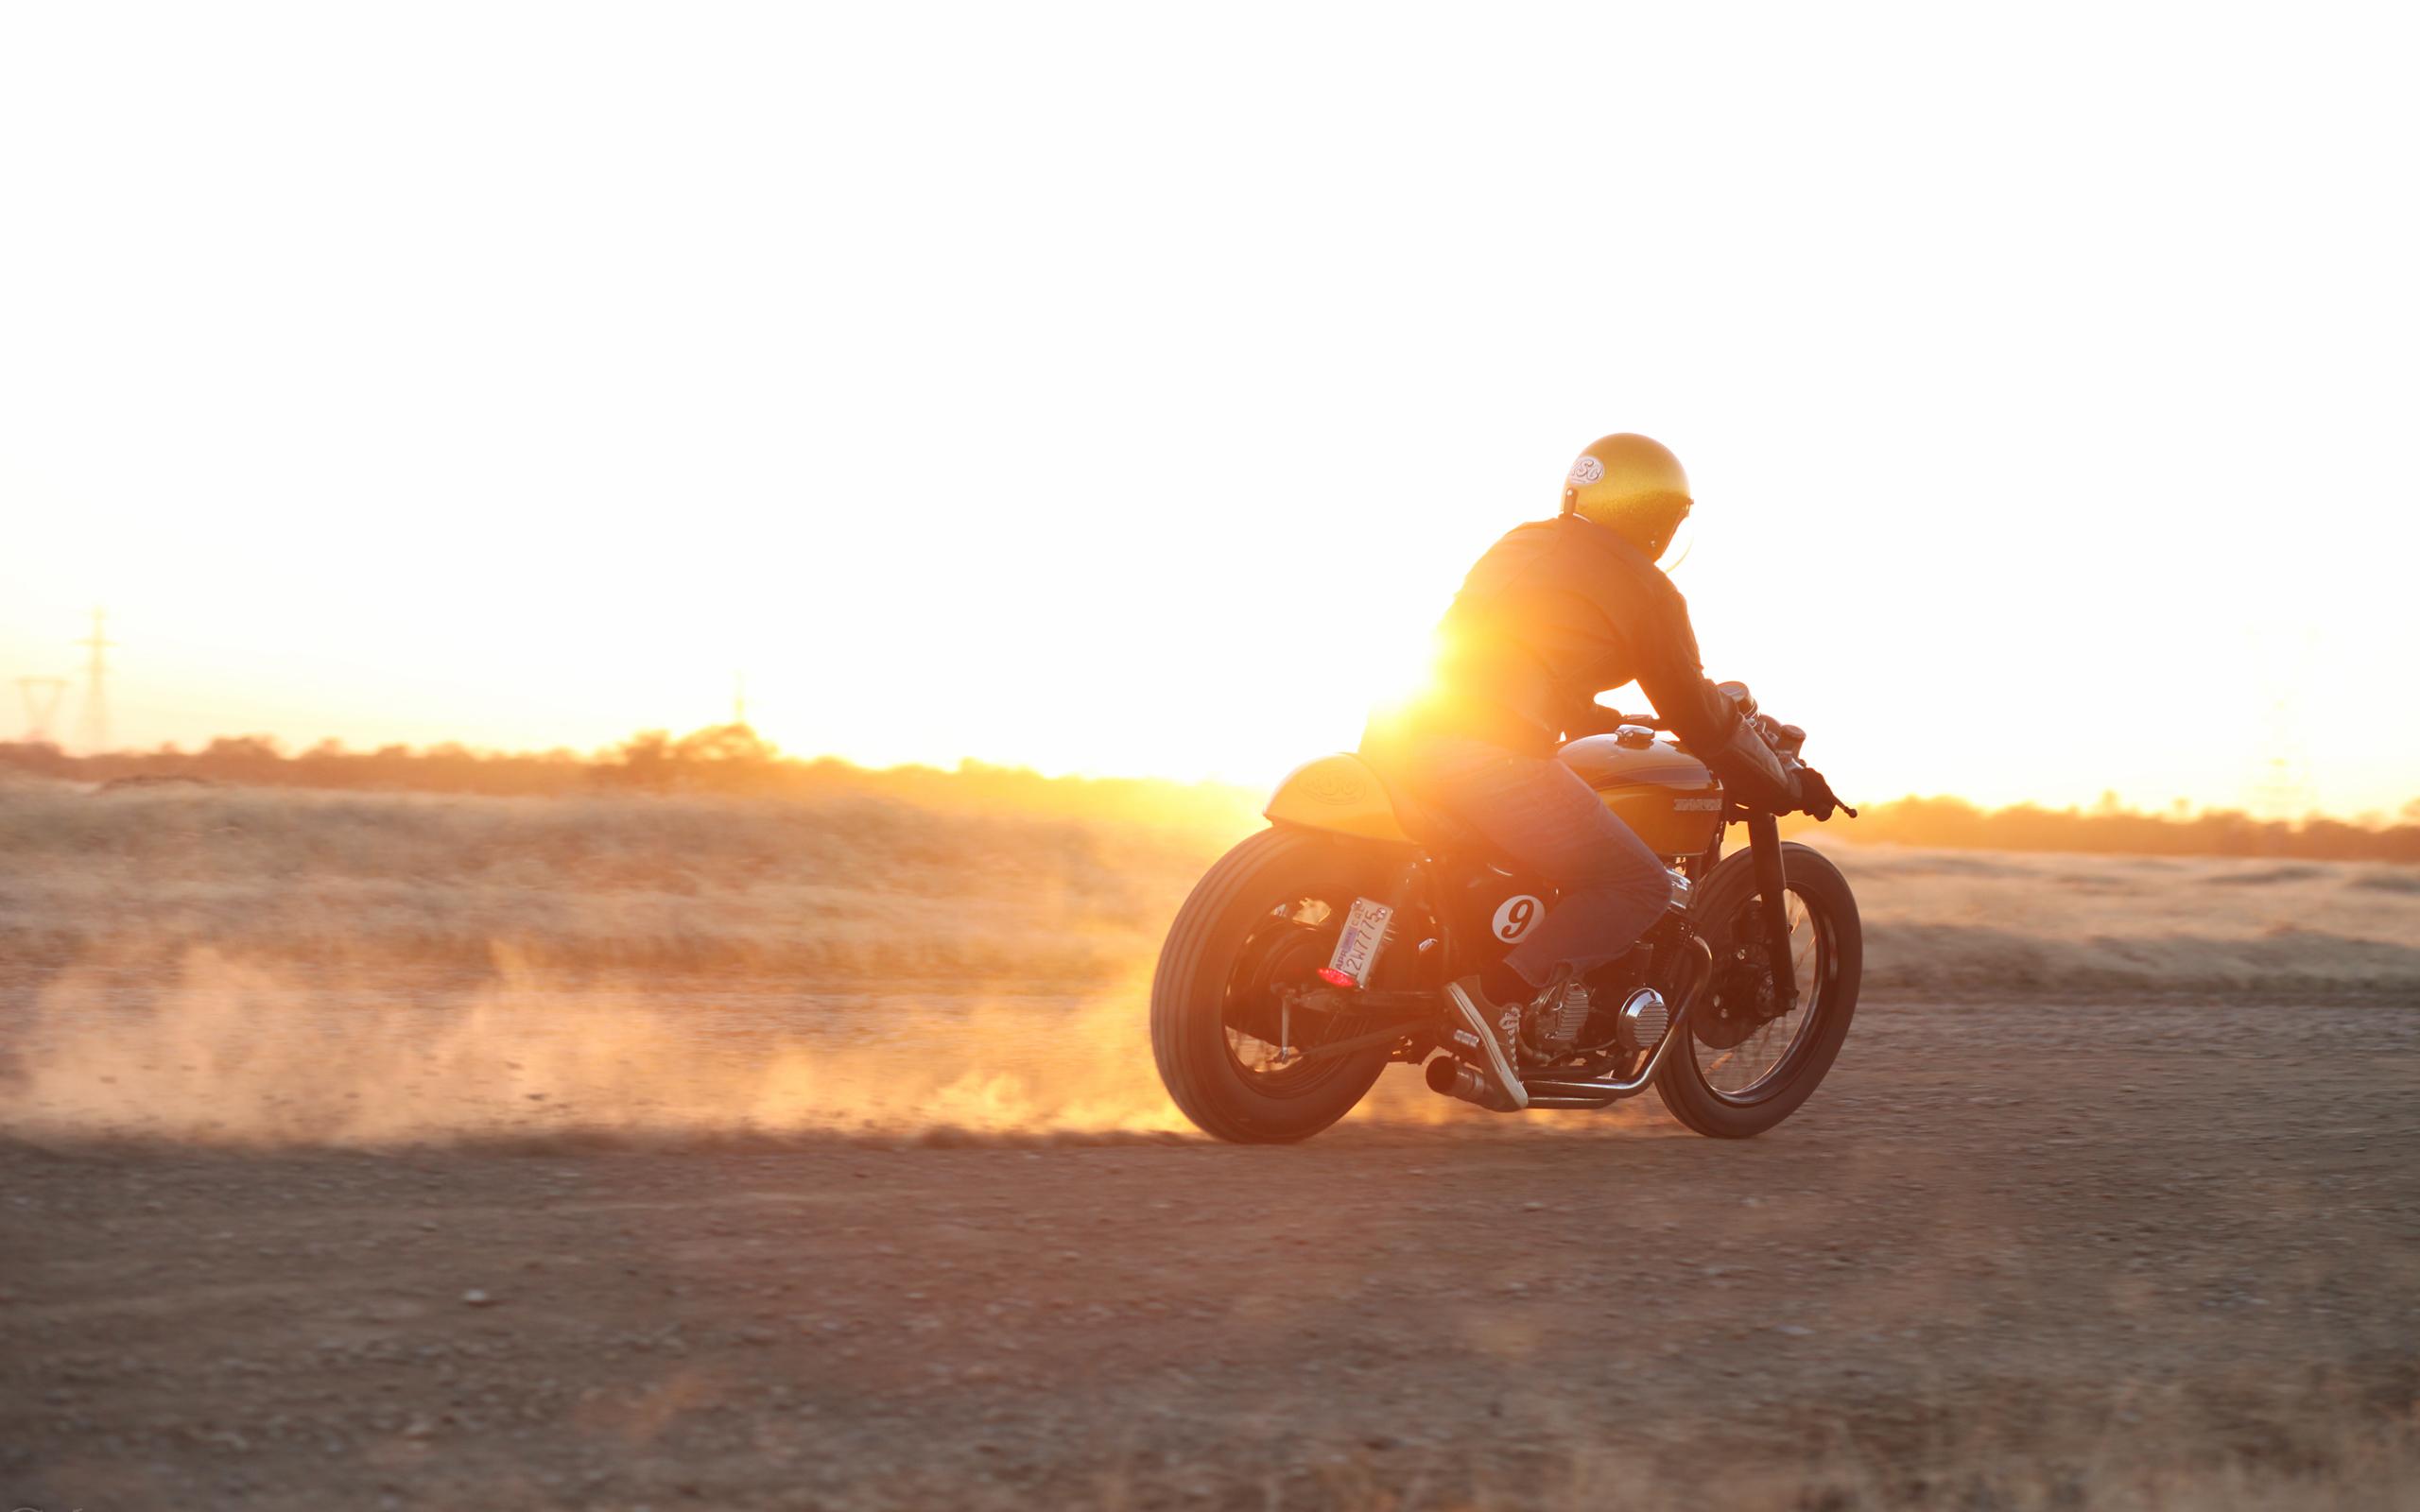 Motorcycle Sunset bike race racing wallpaper 2560x1600 179363 2560x1600